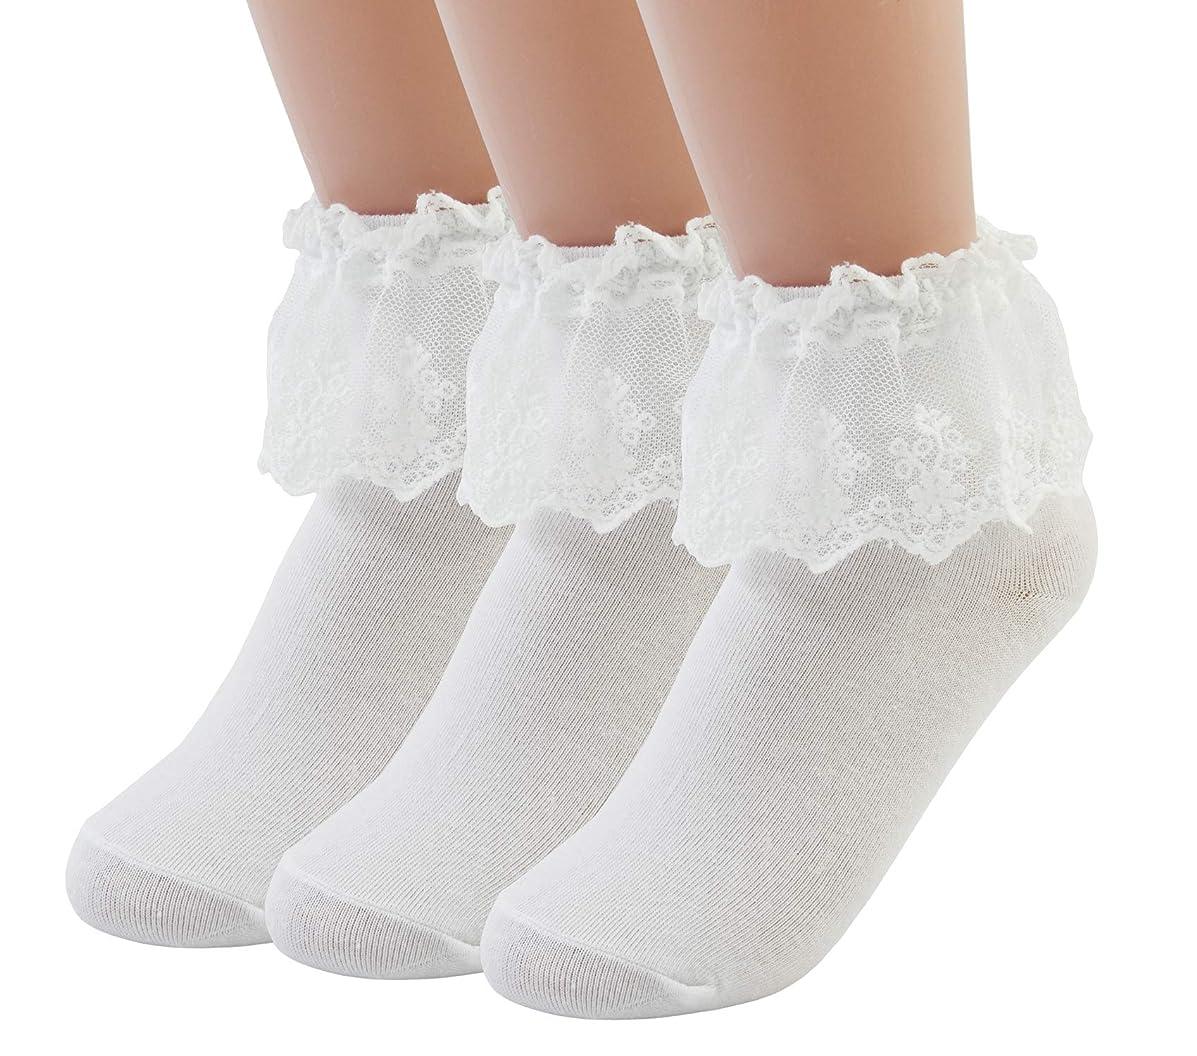 VIVIKI Women Lace Frilly Ruffle Socks Ankle Socks, Cotton Socks 3-Pack 7101